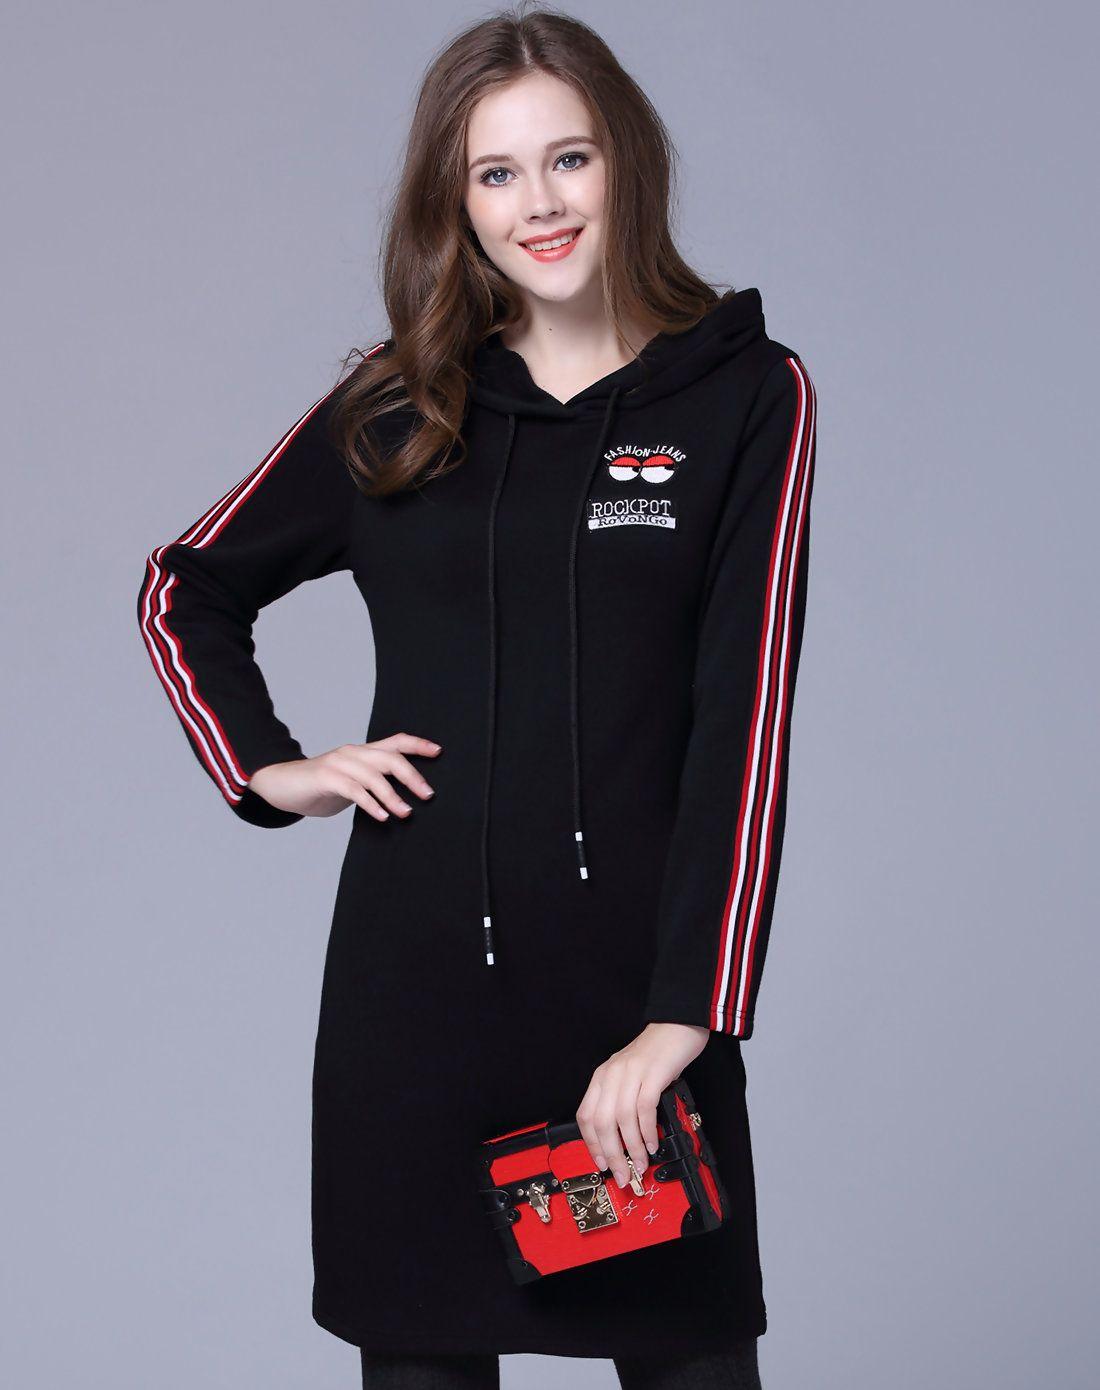 Adorewe vipme shift dresses ochanal black cartoon hoodie fleece